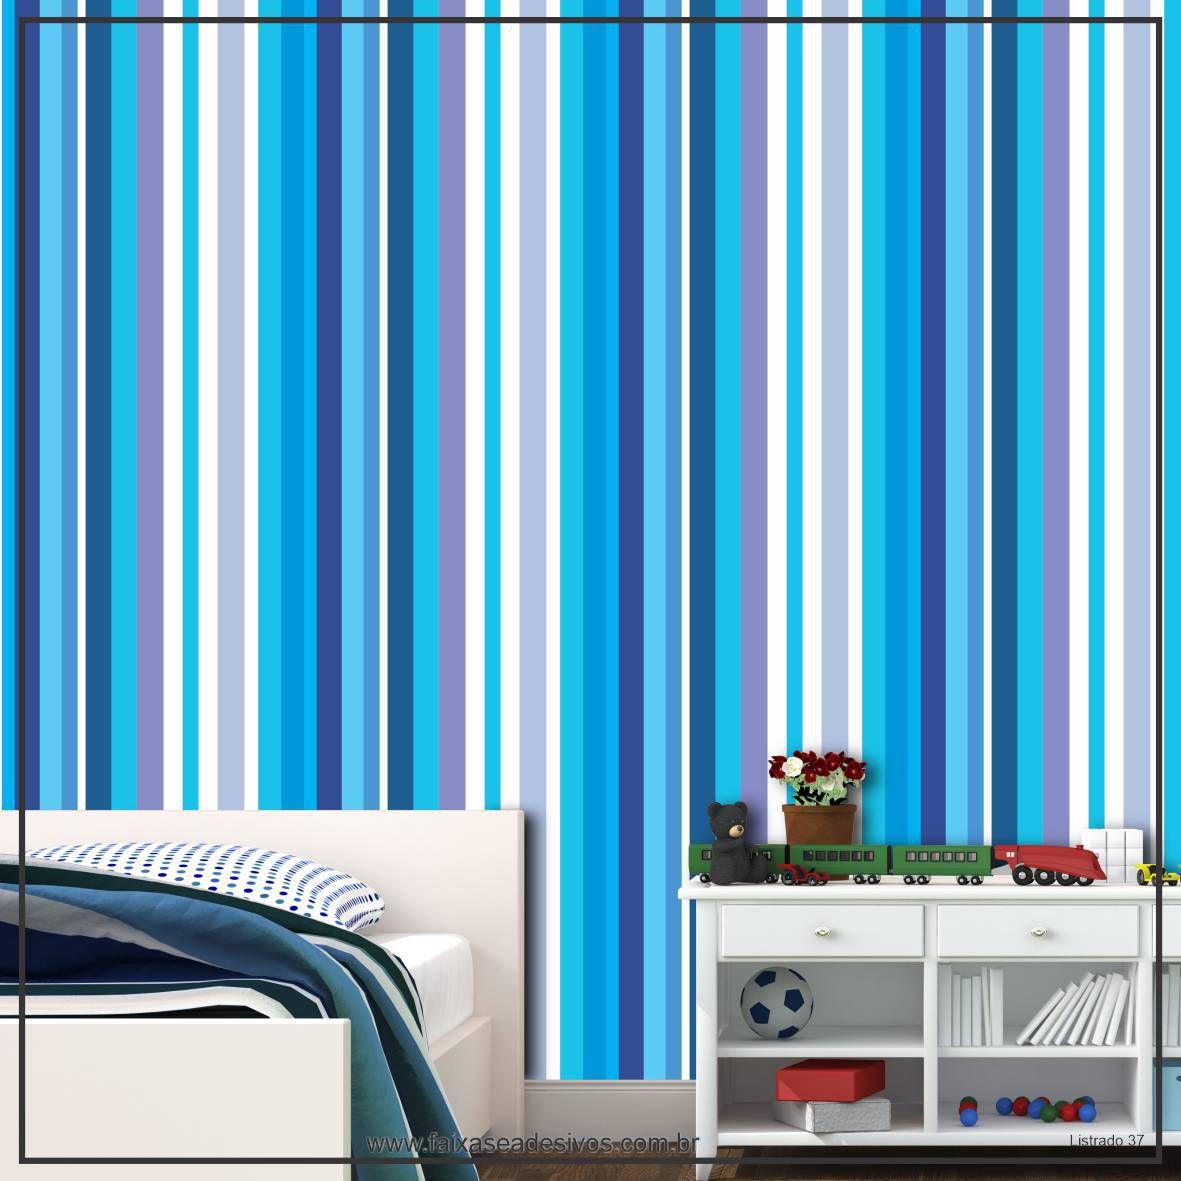 029 - Adesivo Decorativo de parede Listras azul forte - 58cm larg  - Fac Signs